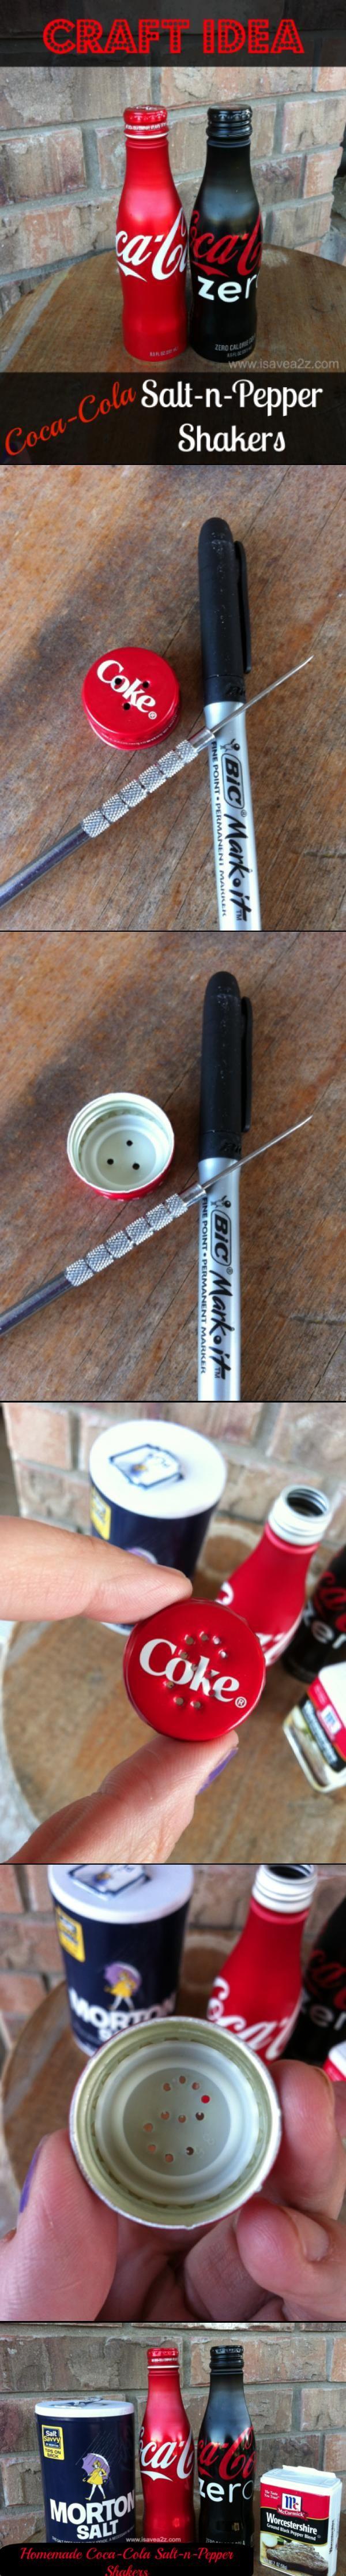 Coca-Cola Salt N Pepper Shakers HOMEMADE!!!  Super Cute and Easy too!